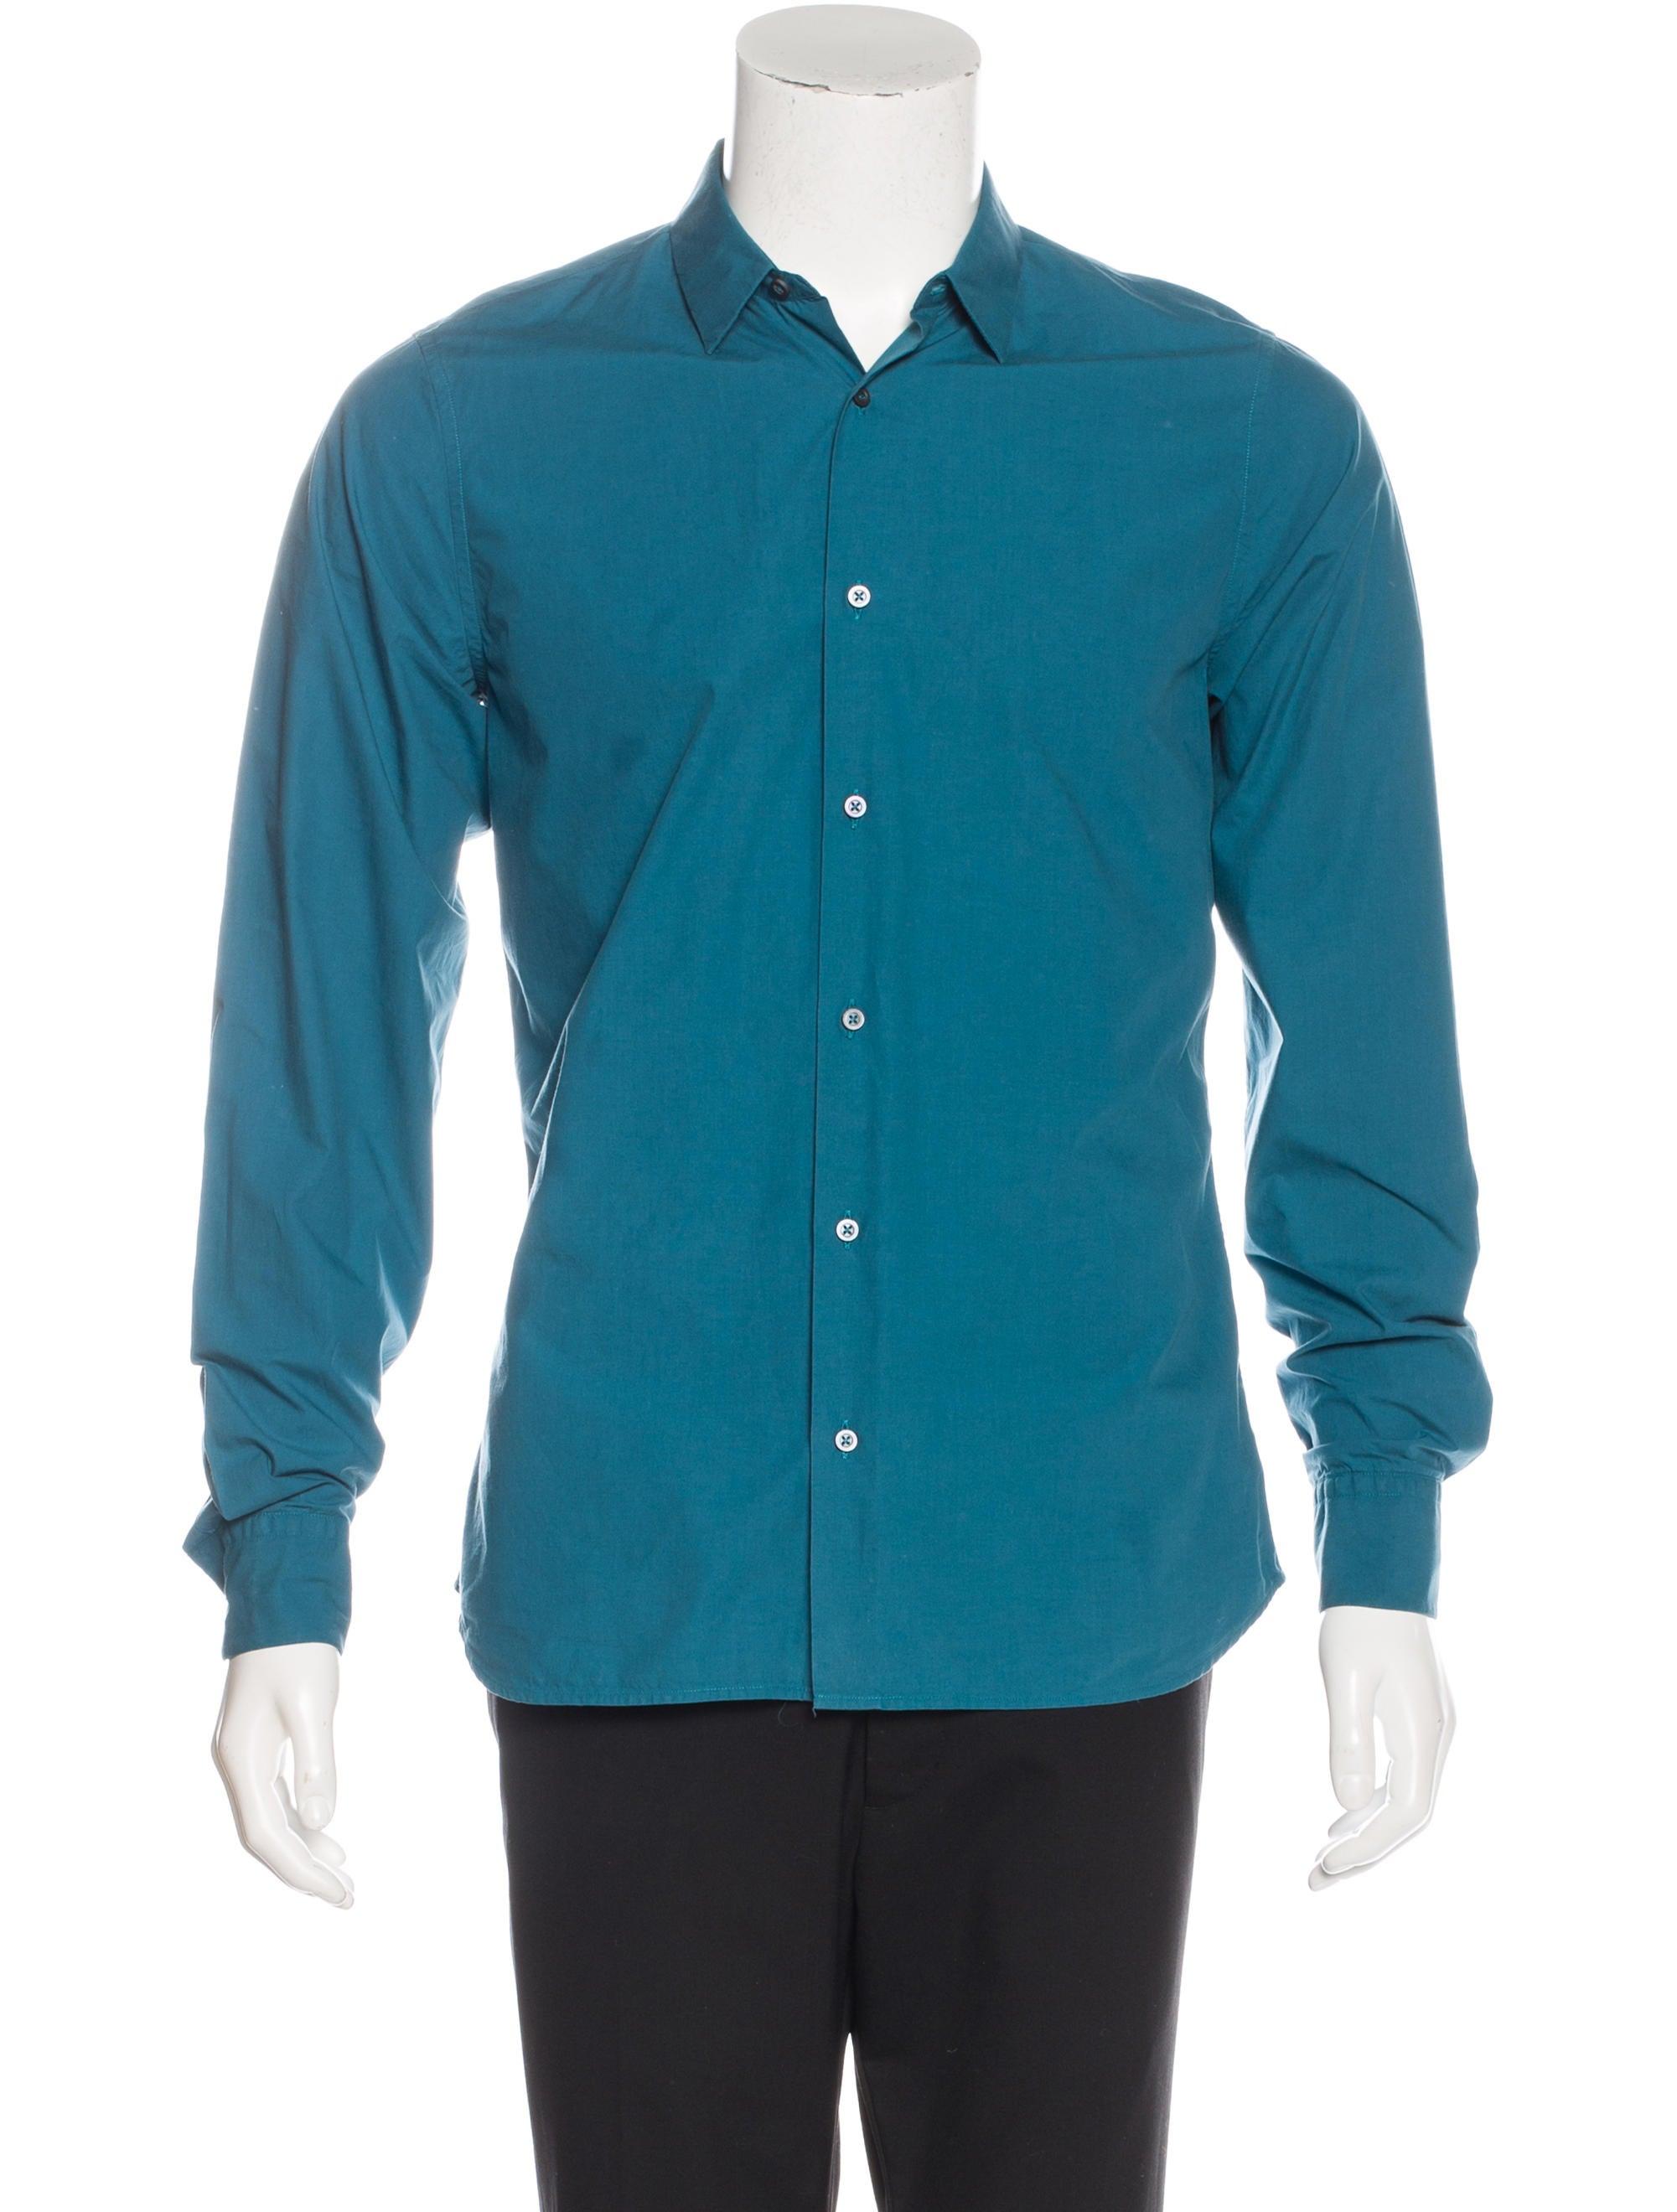 Jil sander woven dress shirt clothing jil35639 the for Jil sander mens shirt